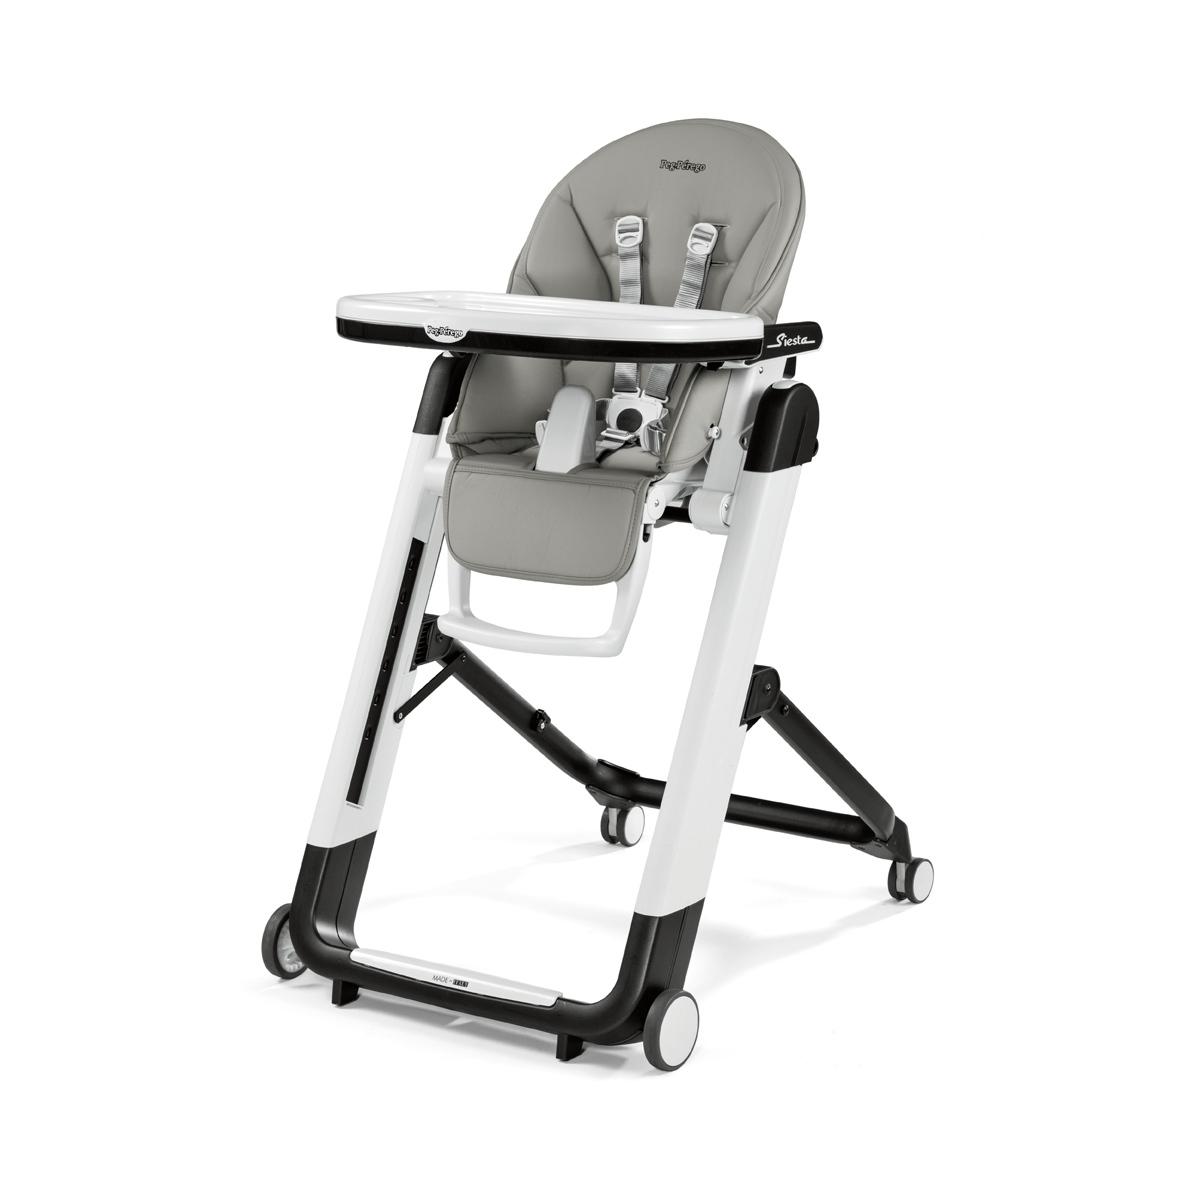 Chaise haute siesta ice imsies0003bl73 achat vente for Chaise haute des la naissance